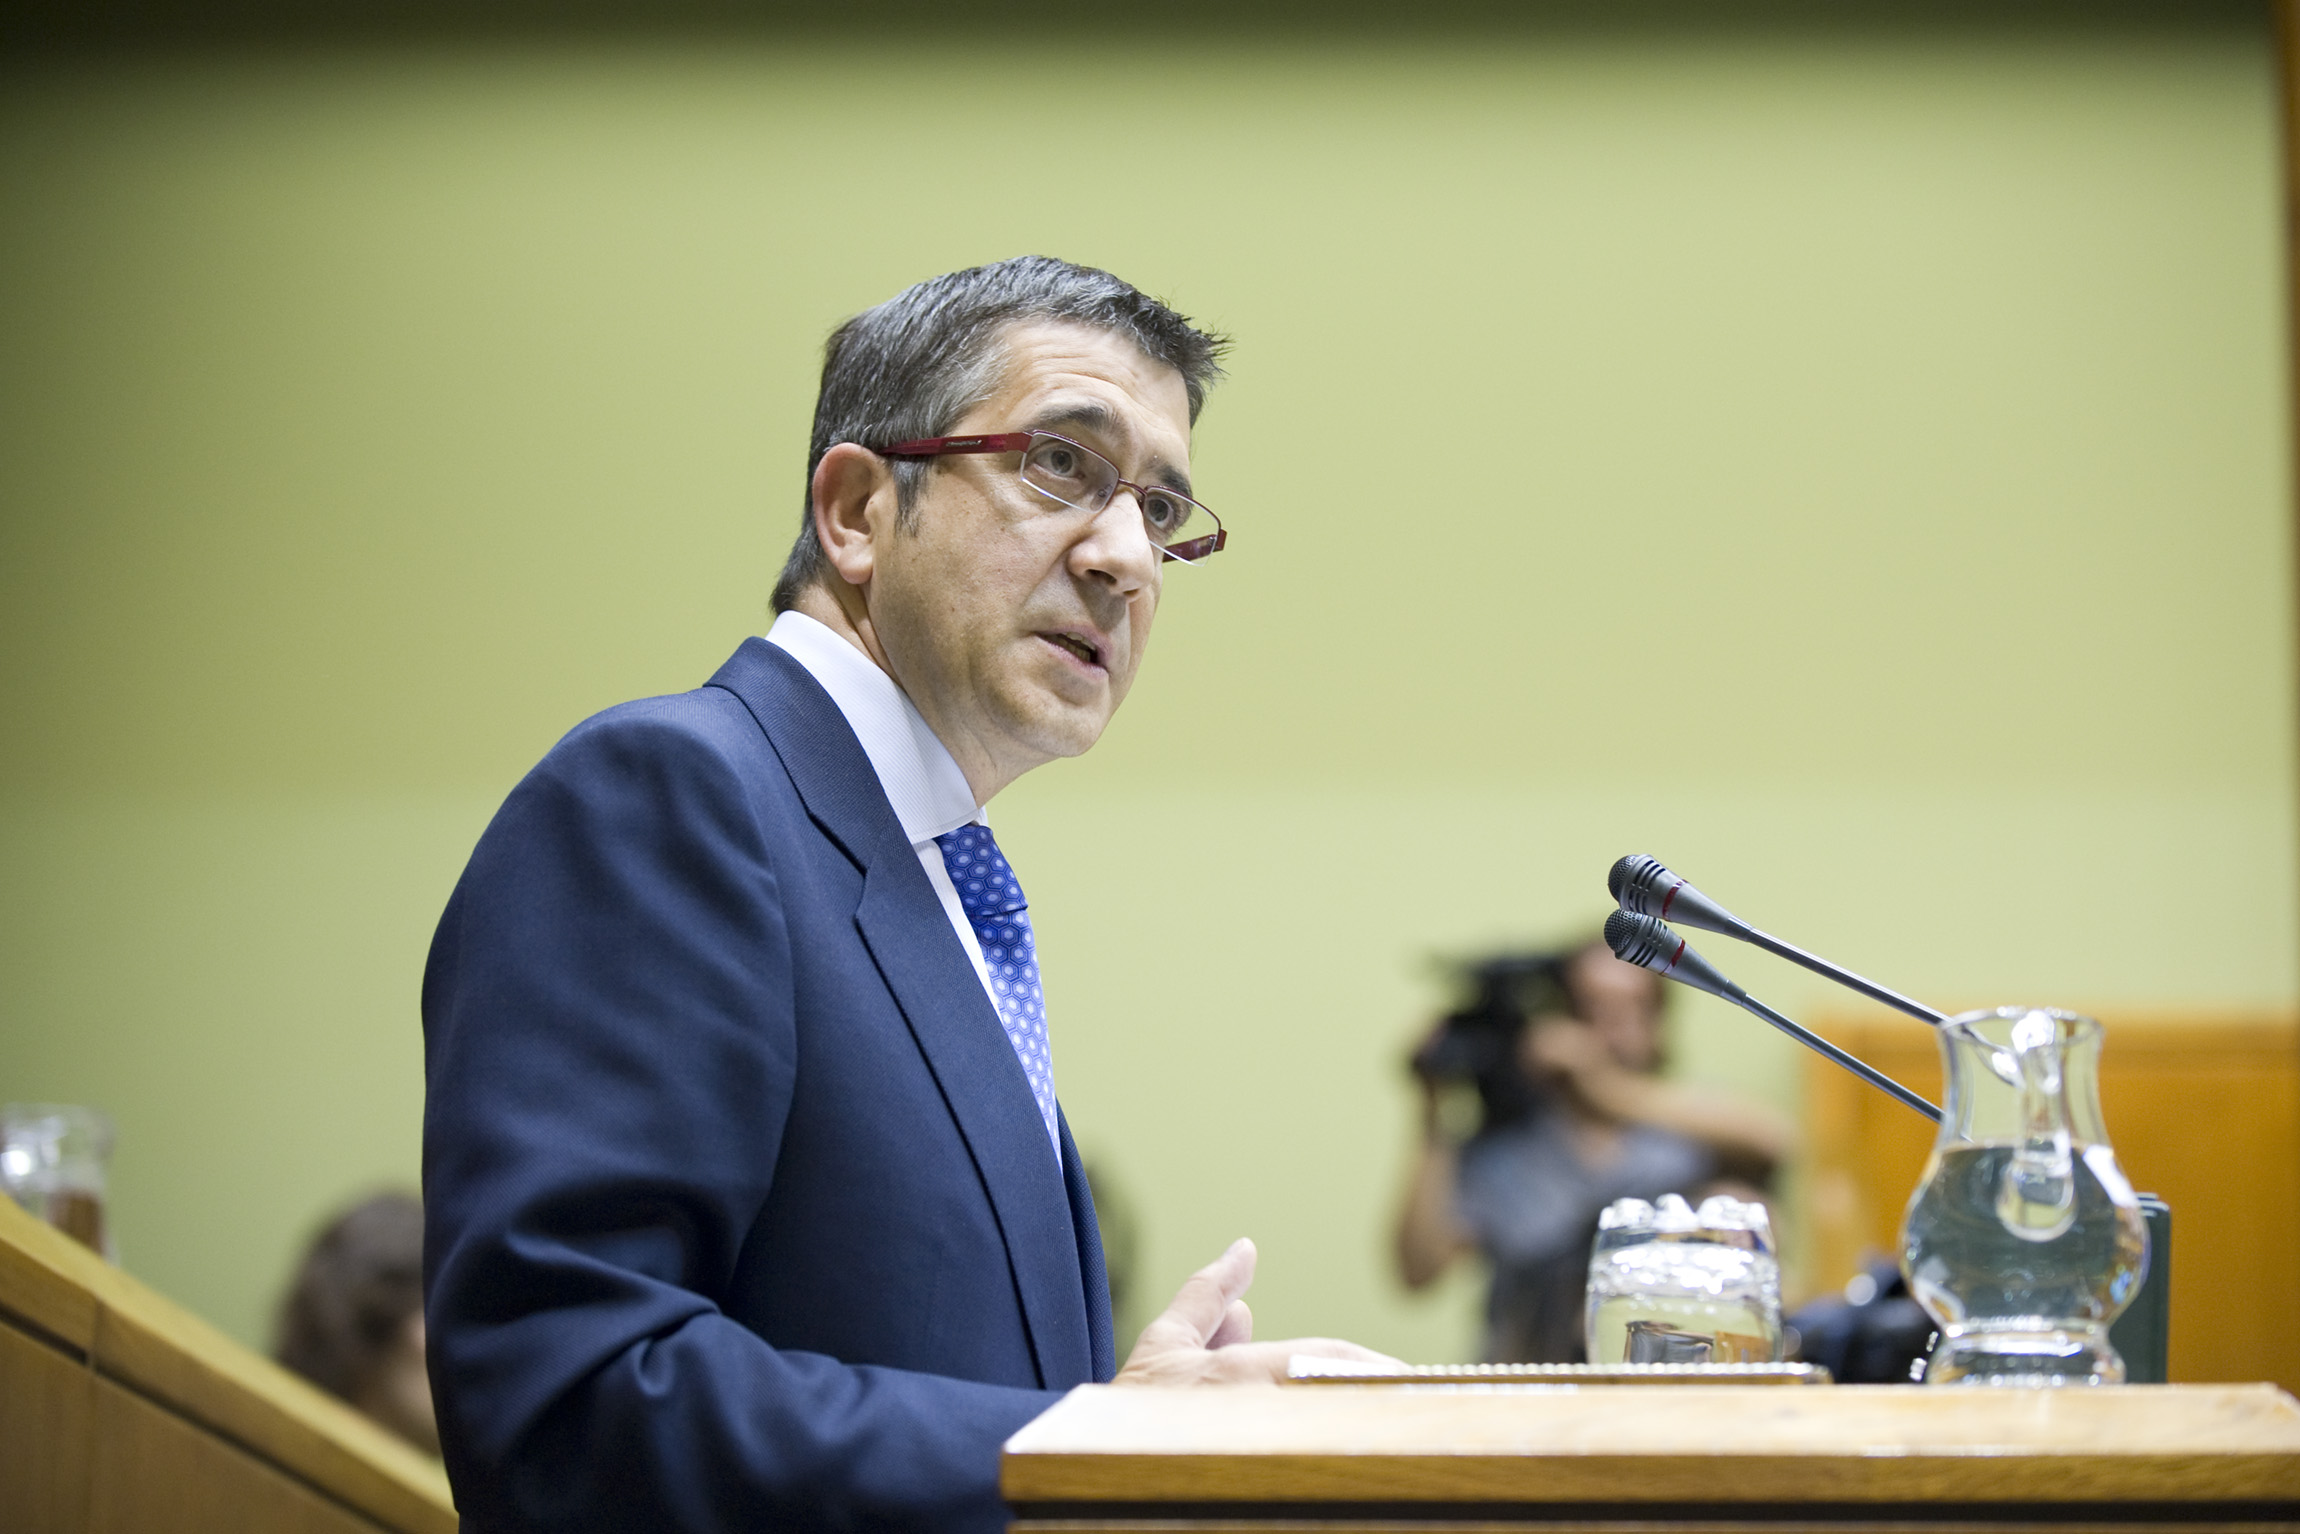 Discurso íntegro del Lehendakari en el Pleno de Política General [91:55]